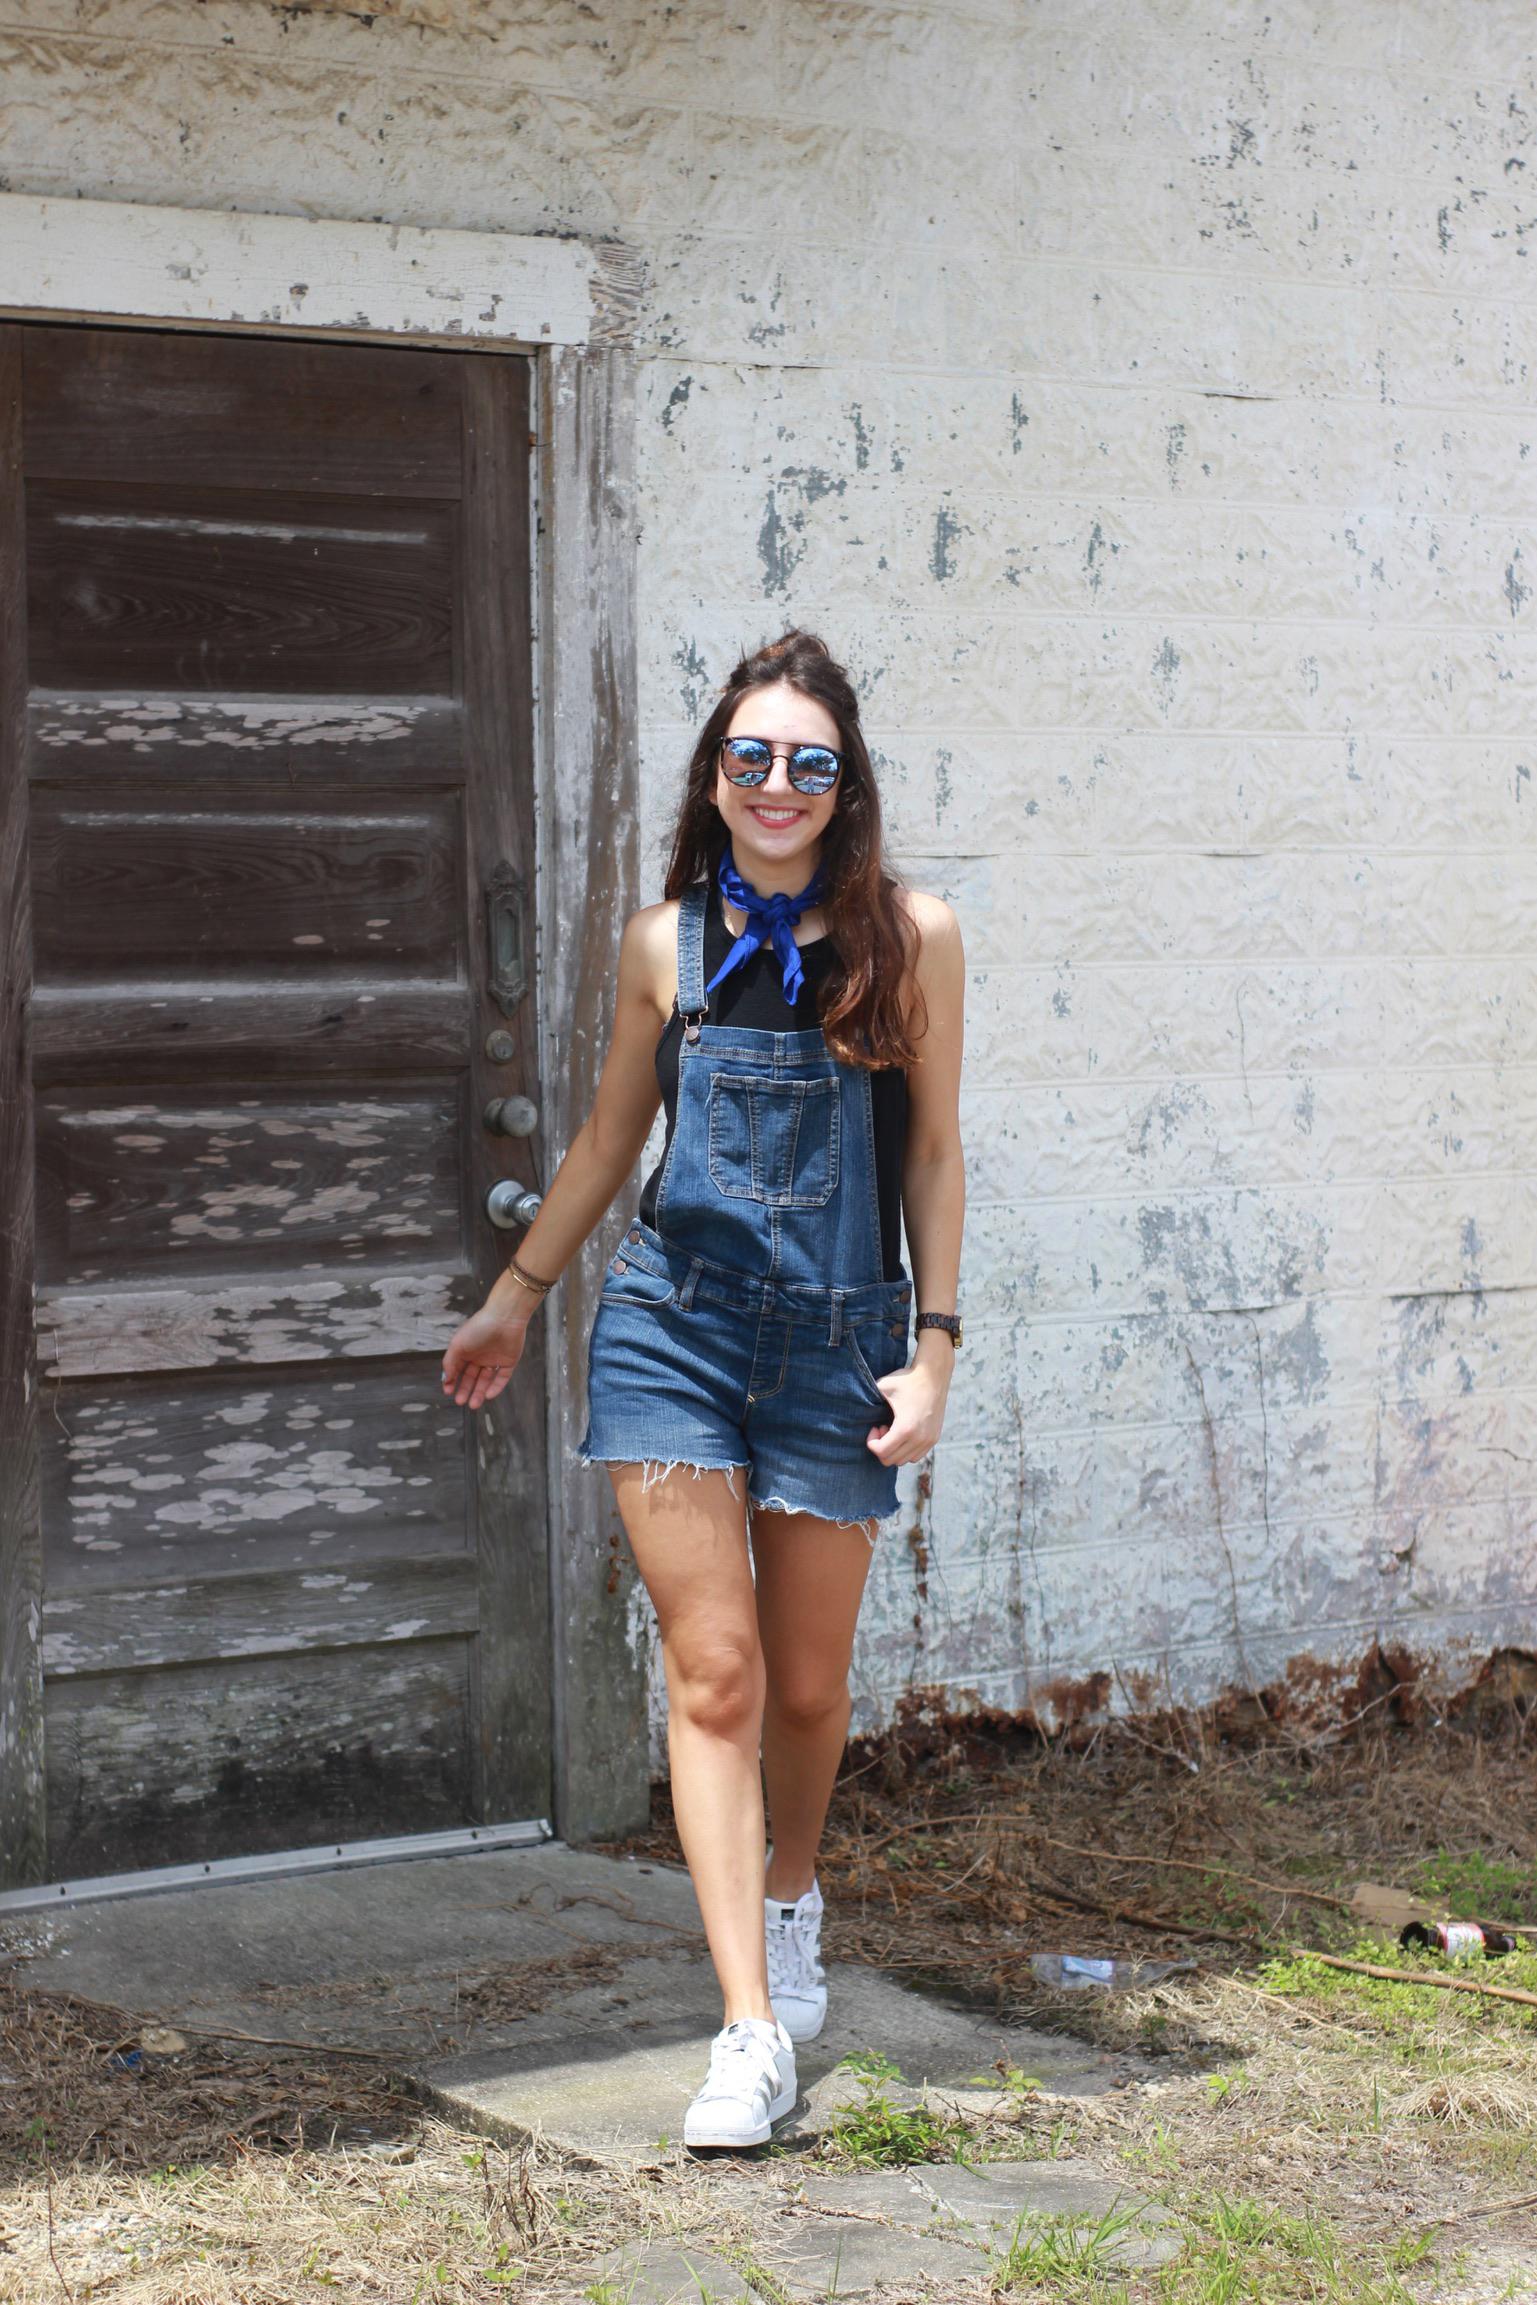 styling-overalls-3-lgip